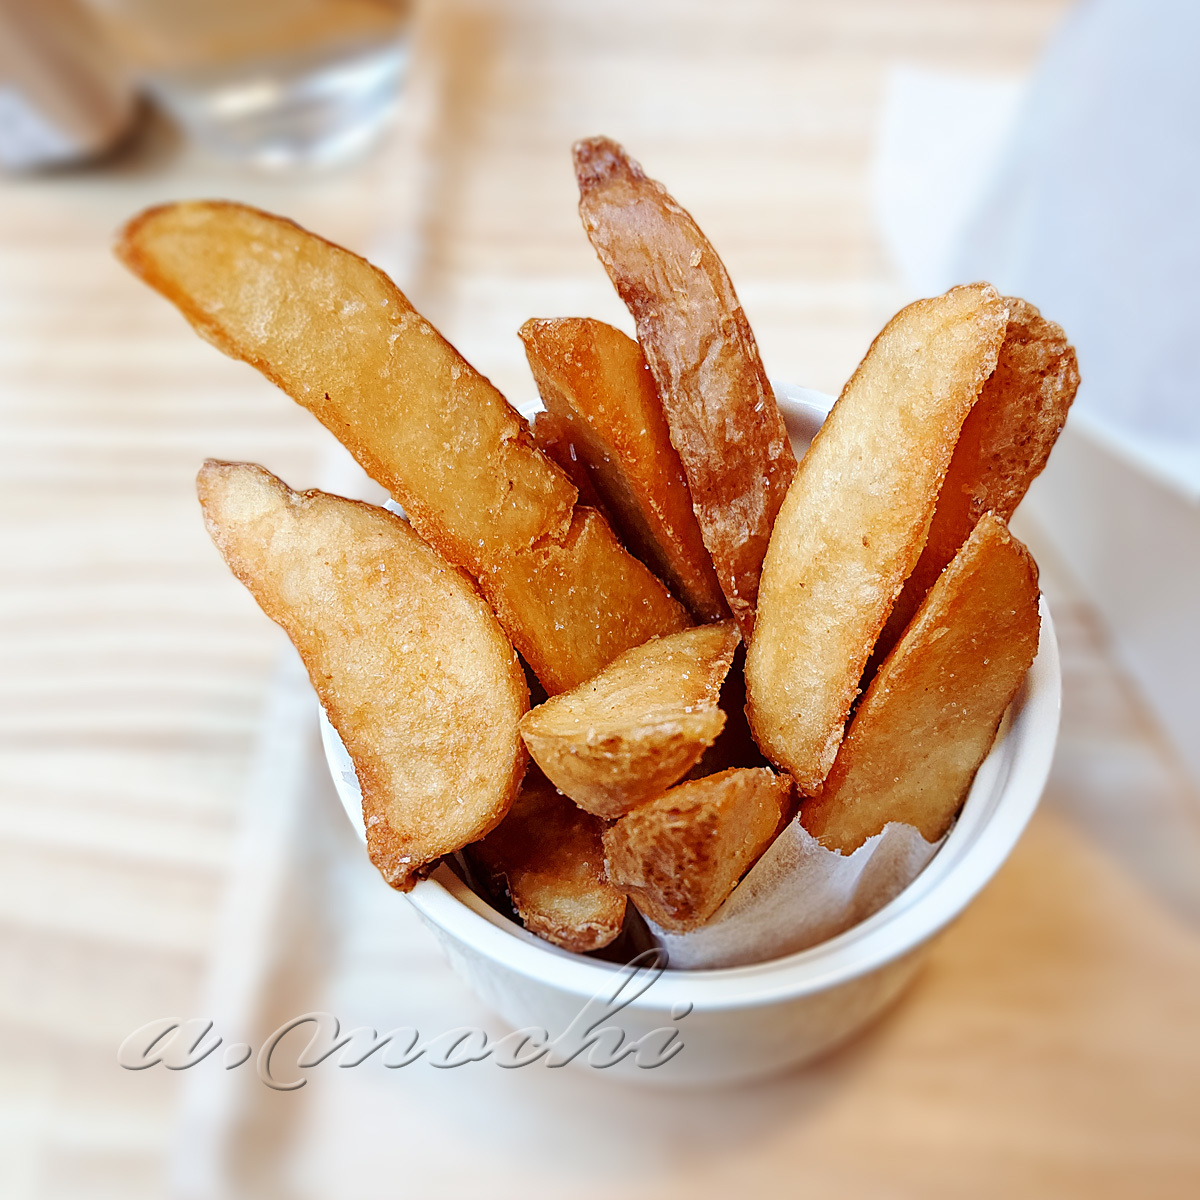 lifelong_potato.jpg